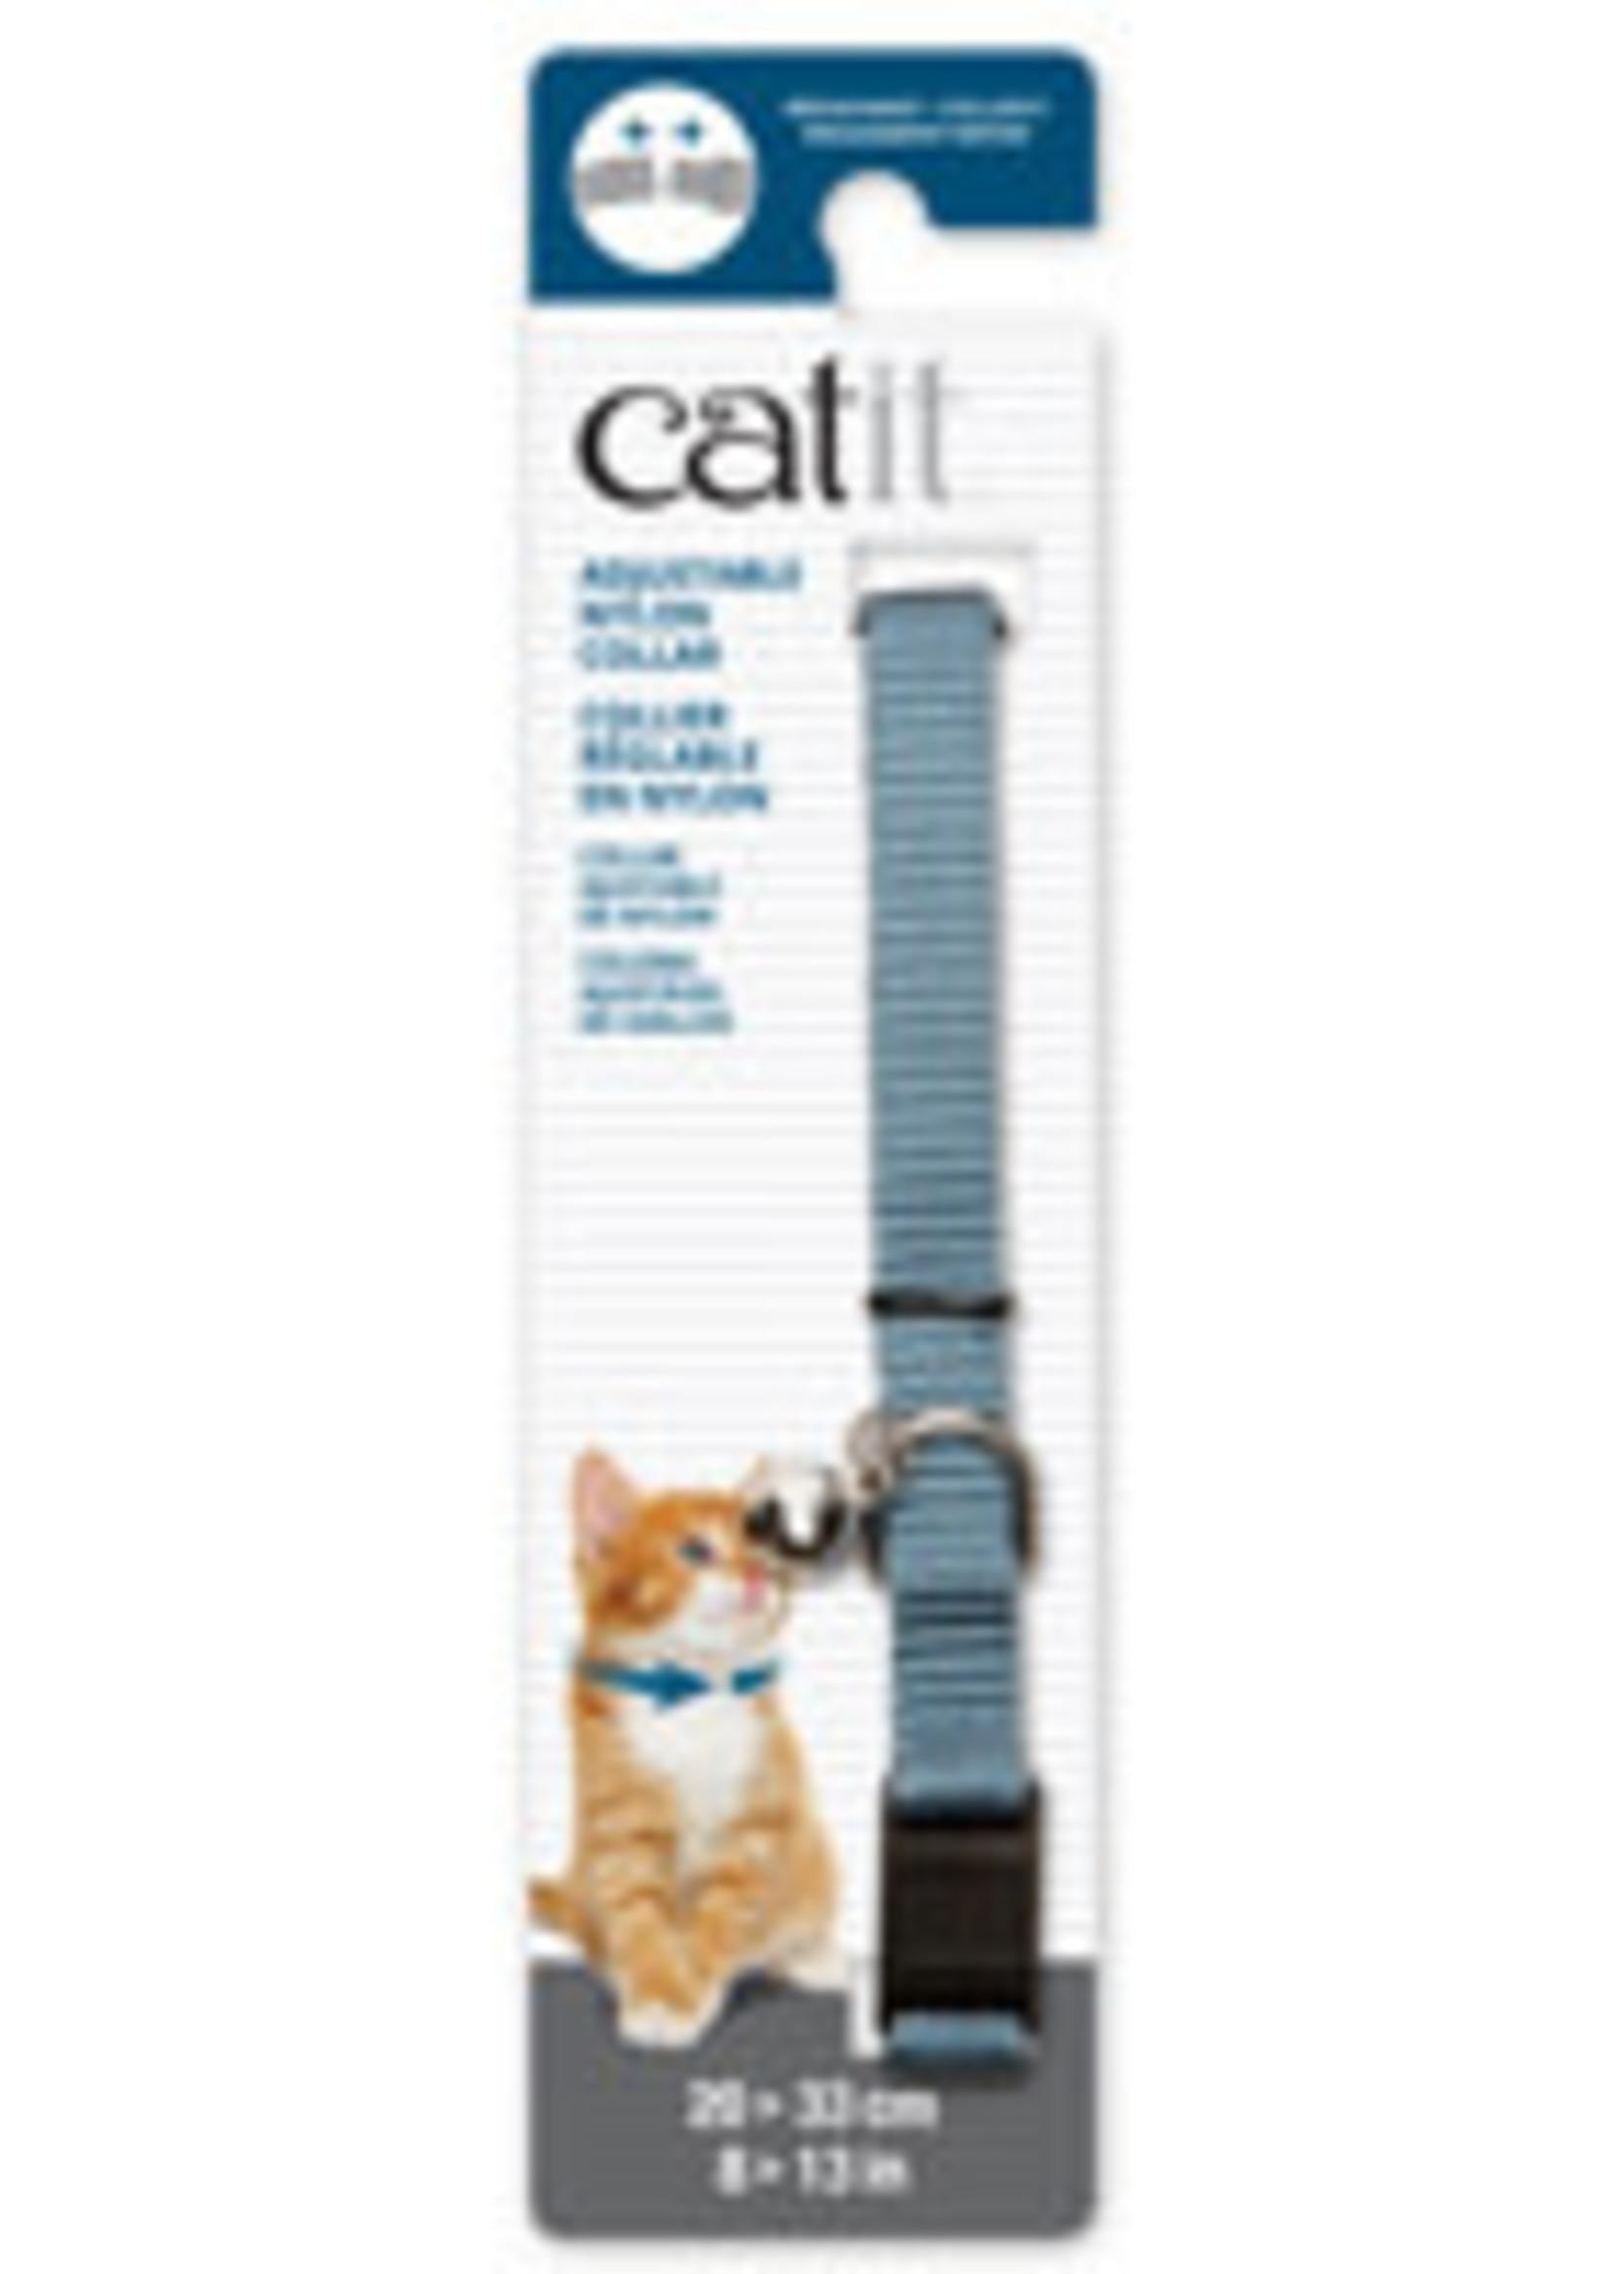 CatIt Breakaway Nylon Collar - Blue - 20-33 cm